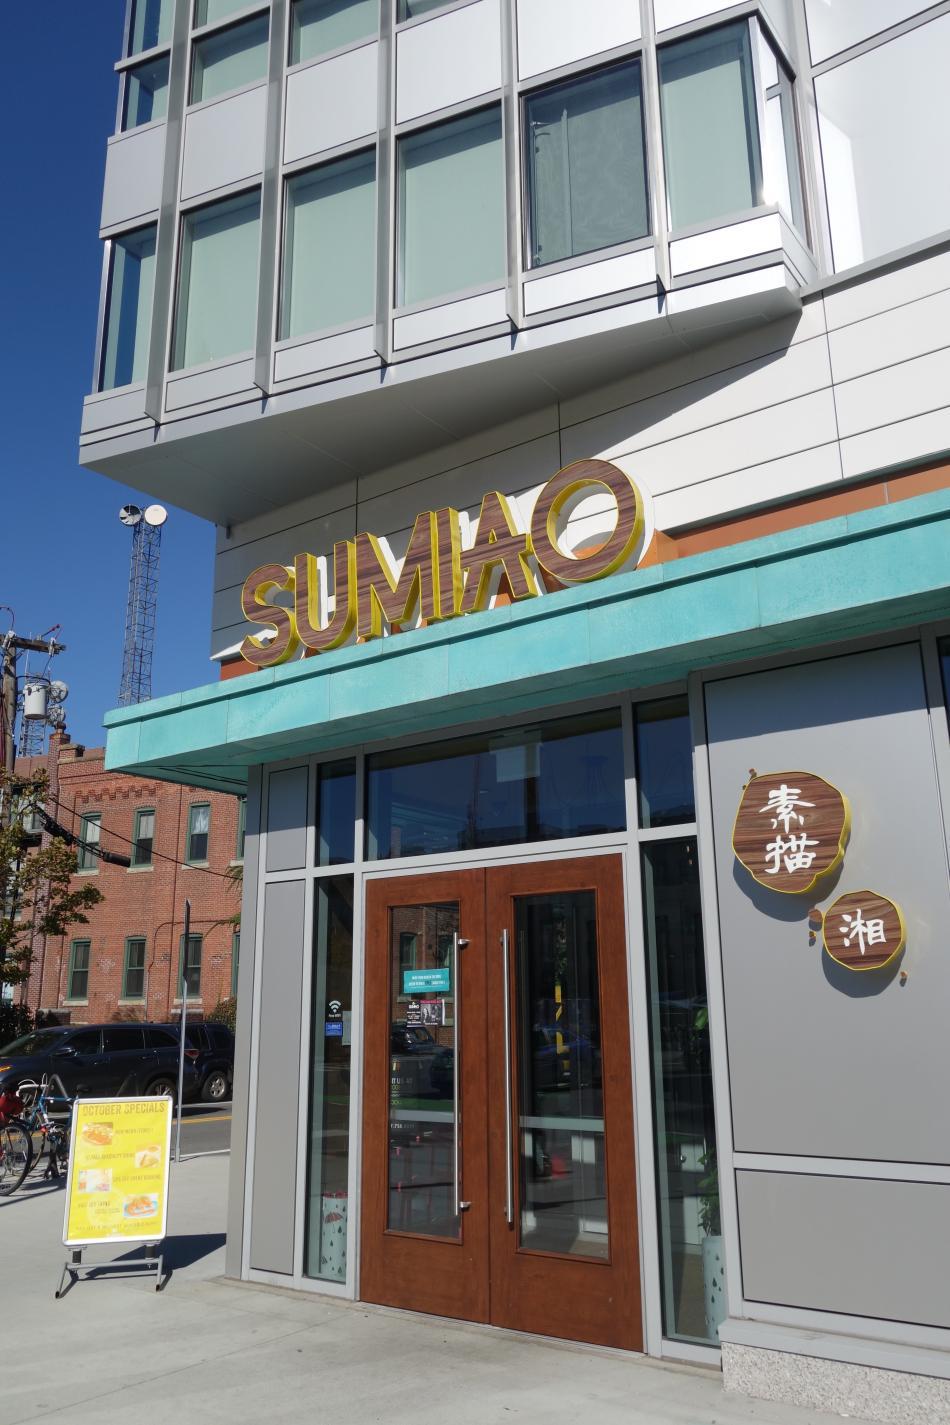 Sumiao Hunan Kitchen